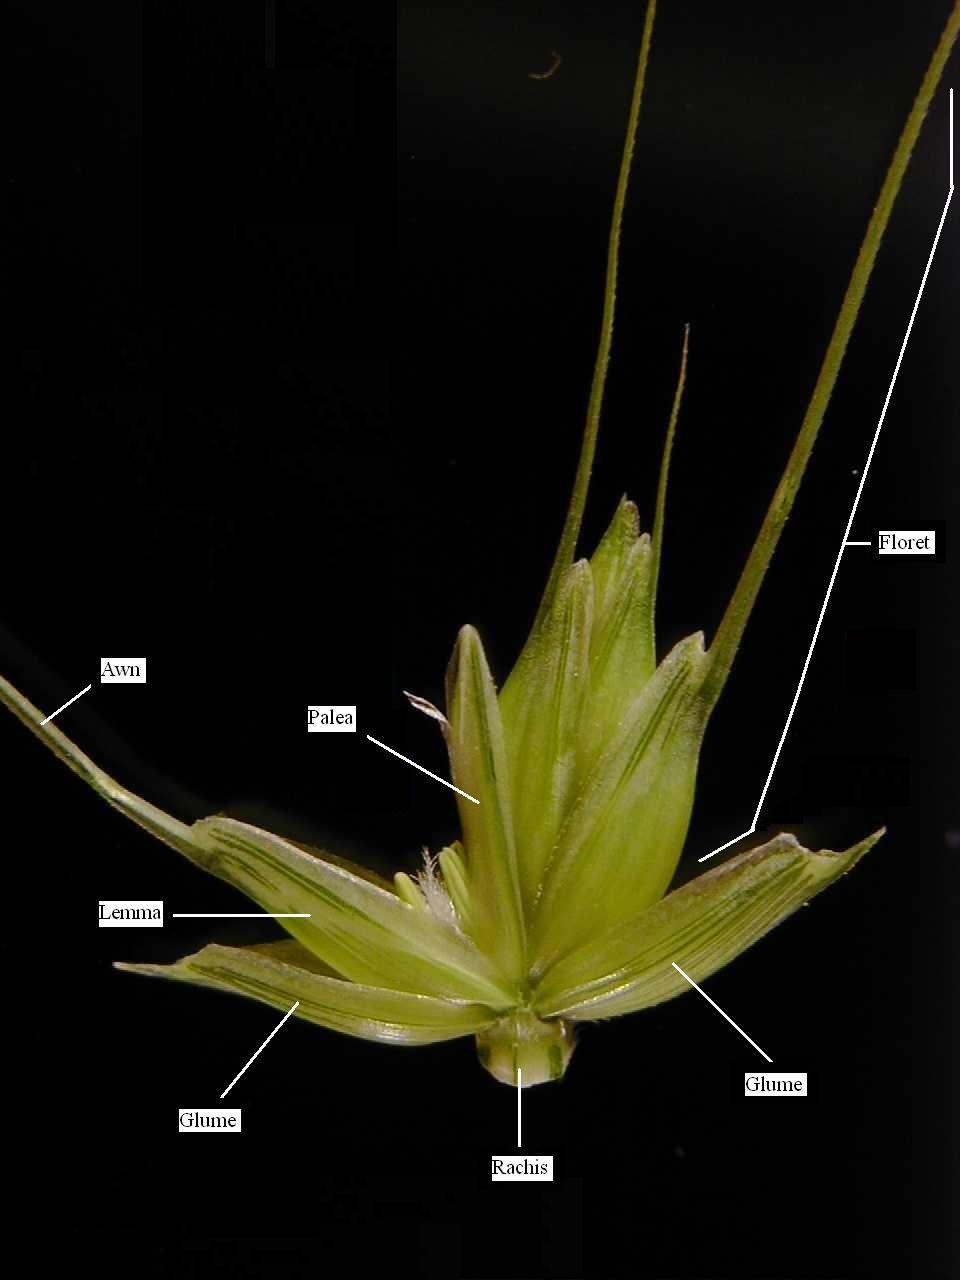 wheat flower anatomy - Google Search | GRASS | Pinterest | Flower ...